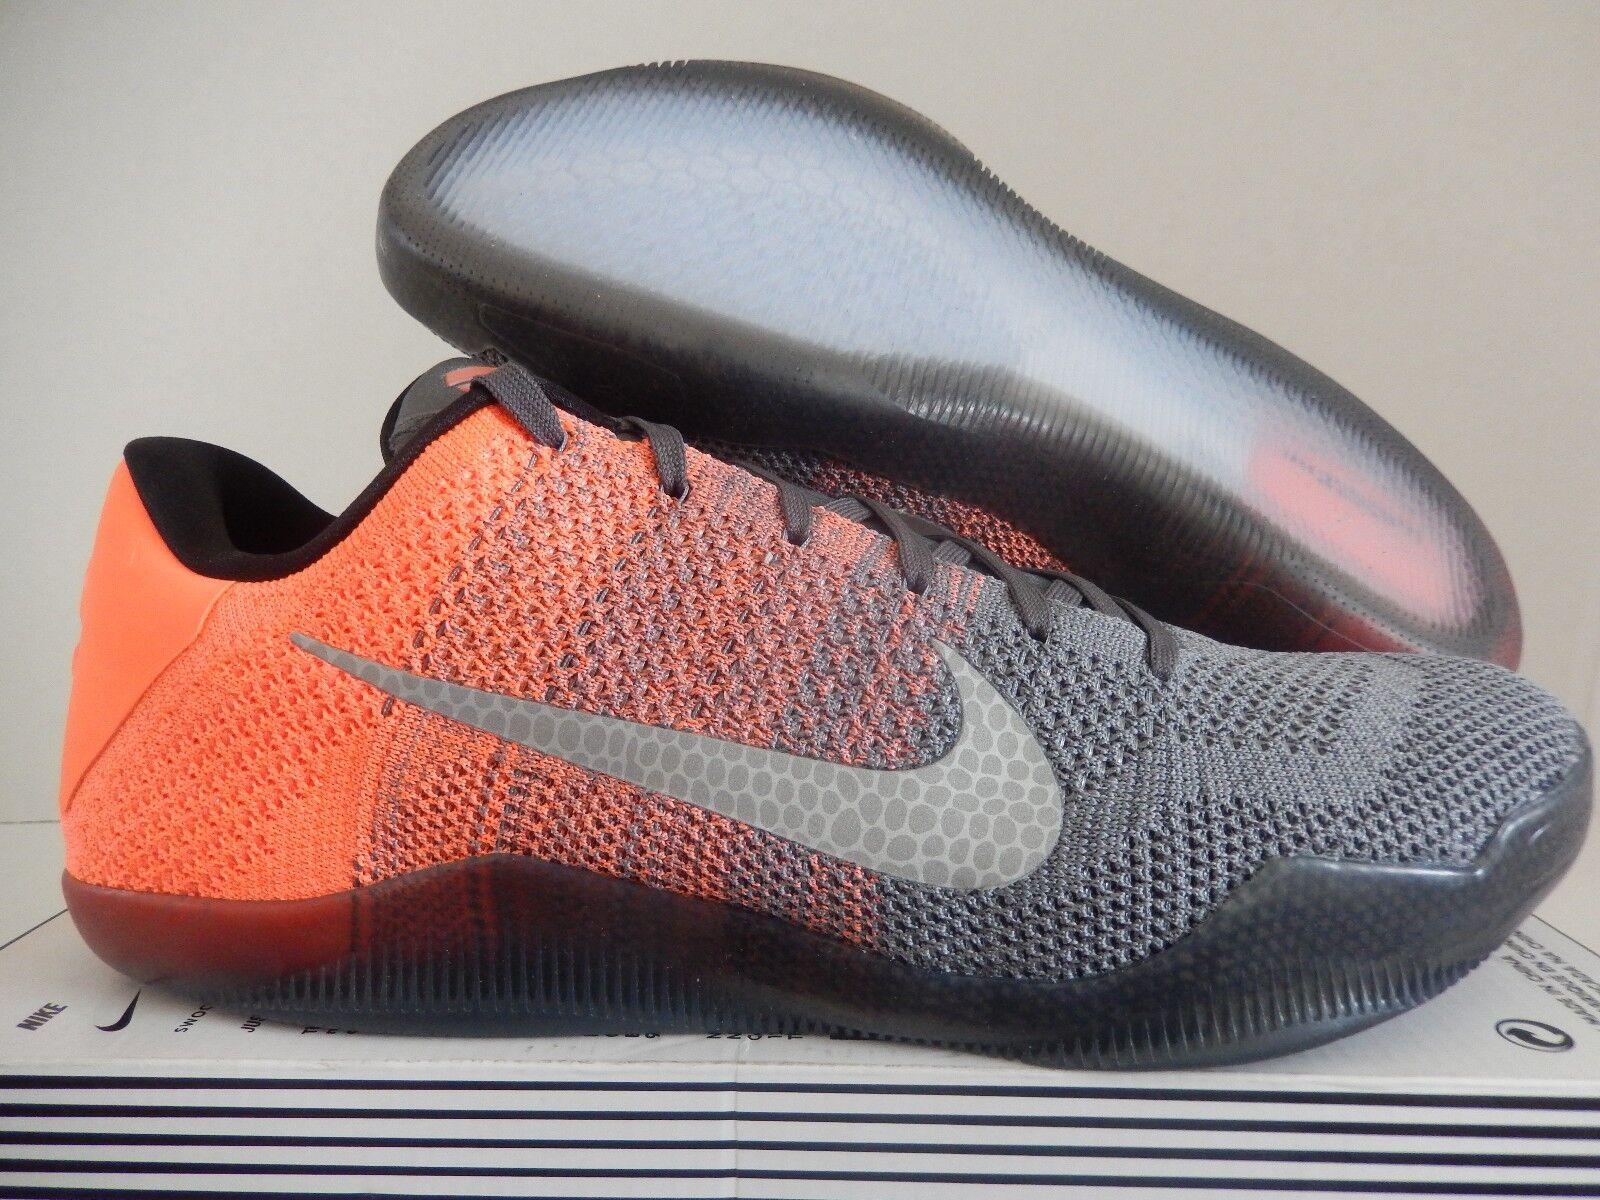 Nike kobe xi 11 elite flyknit pasqua bassa grey-mango sz 14 [822675-078]